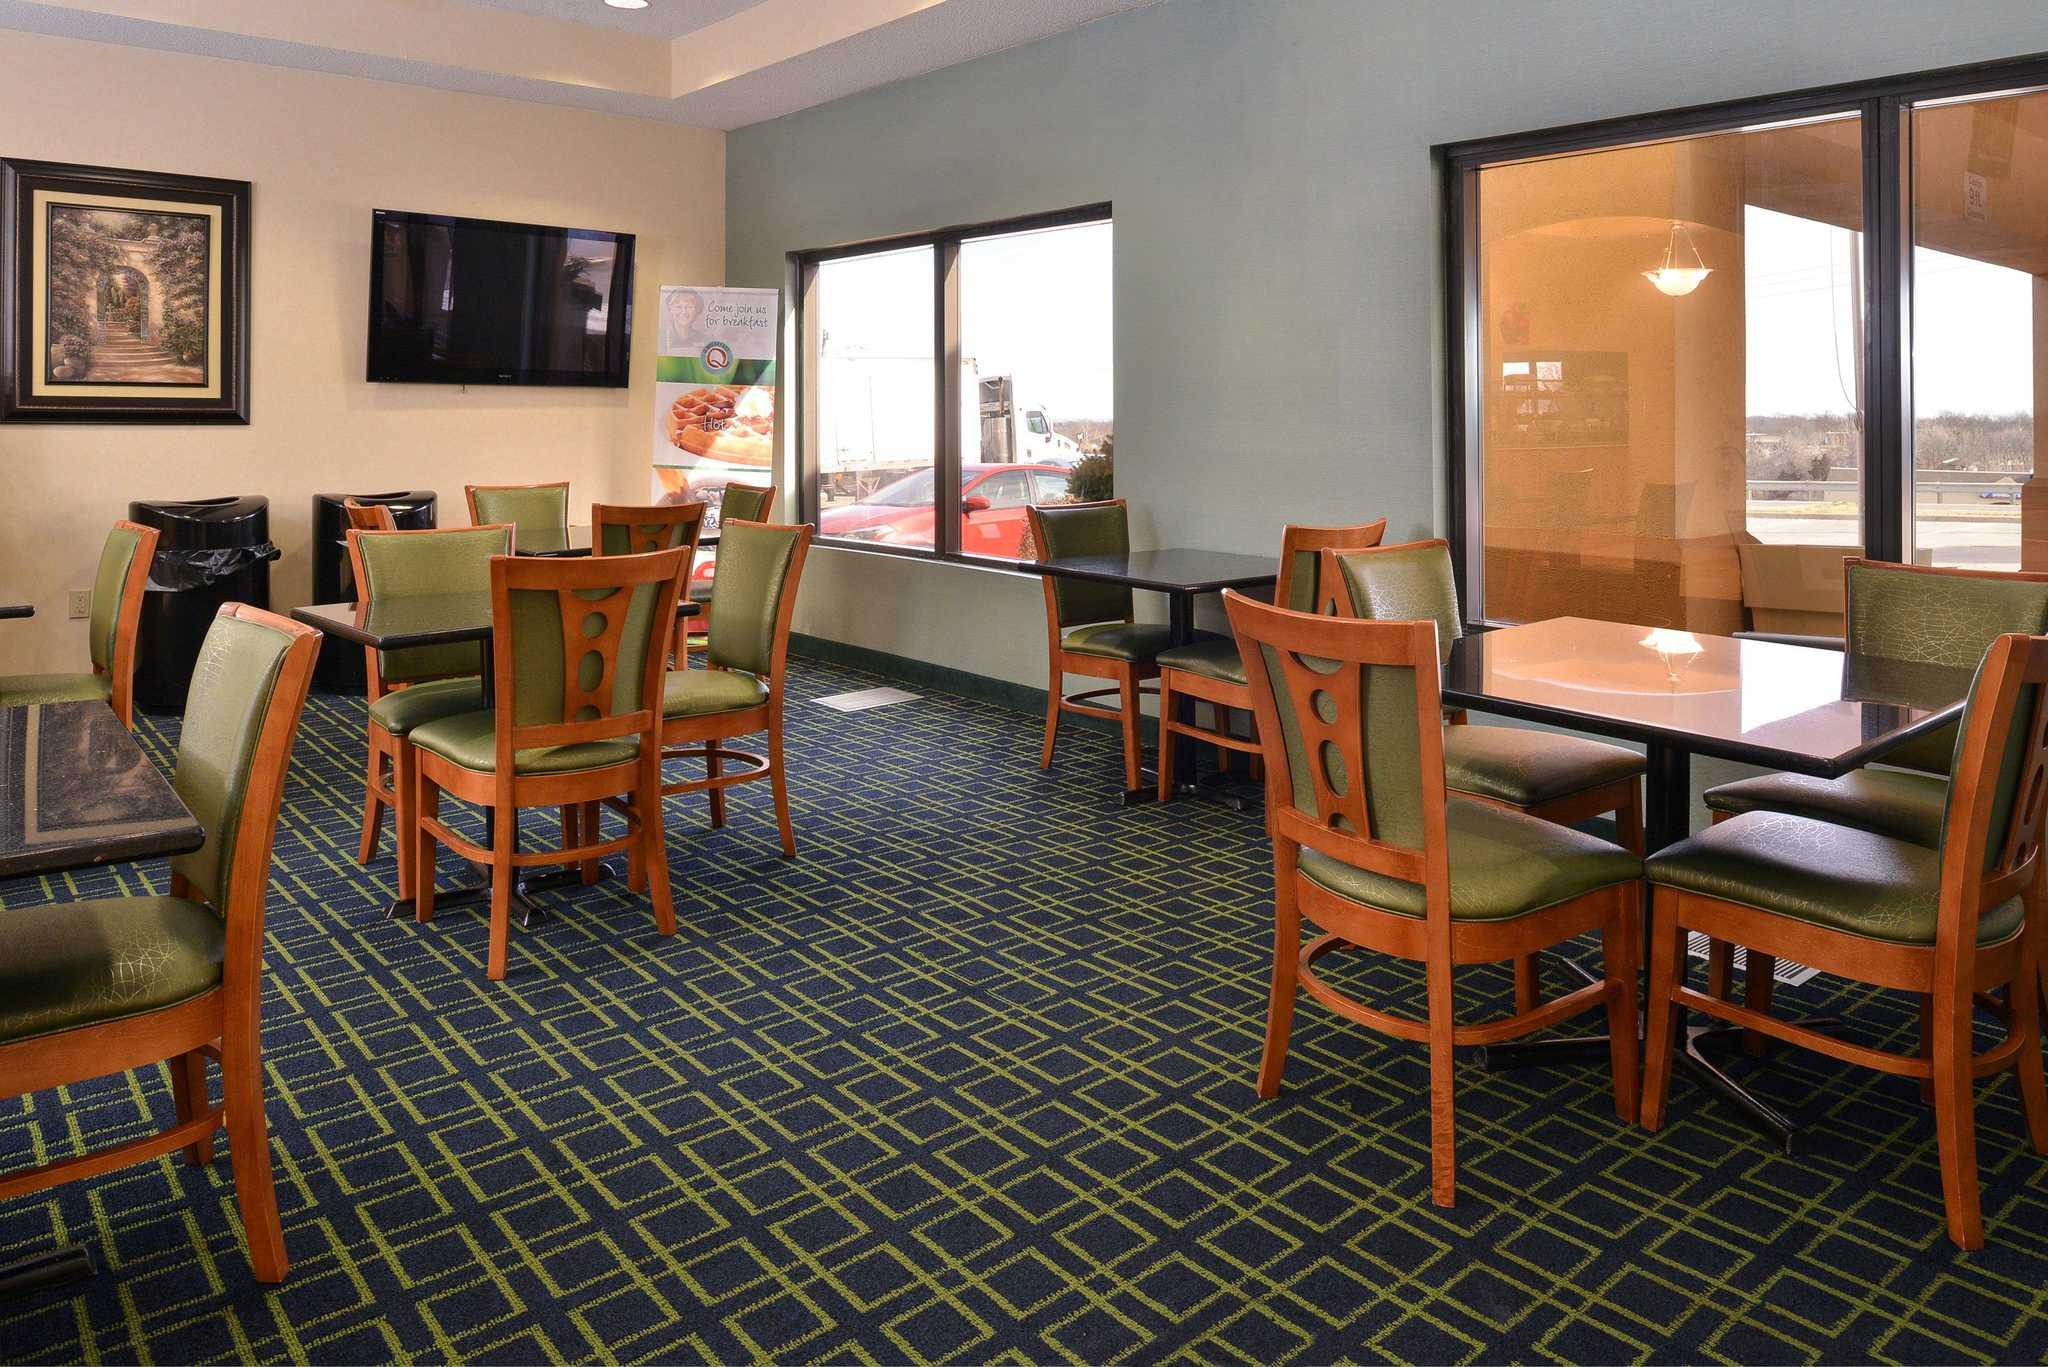 Quality Inn & Suites Jefferson City image 21